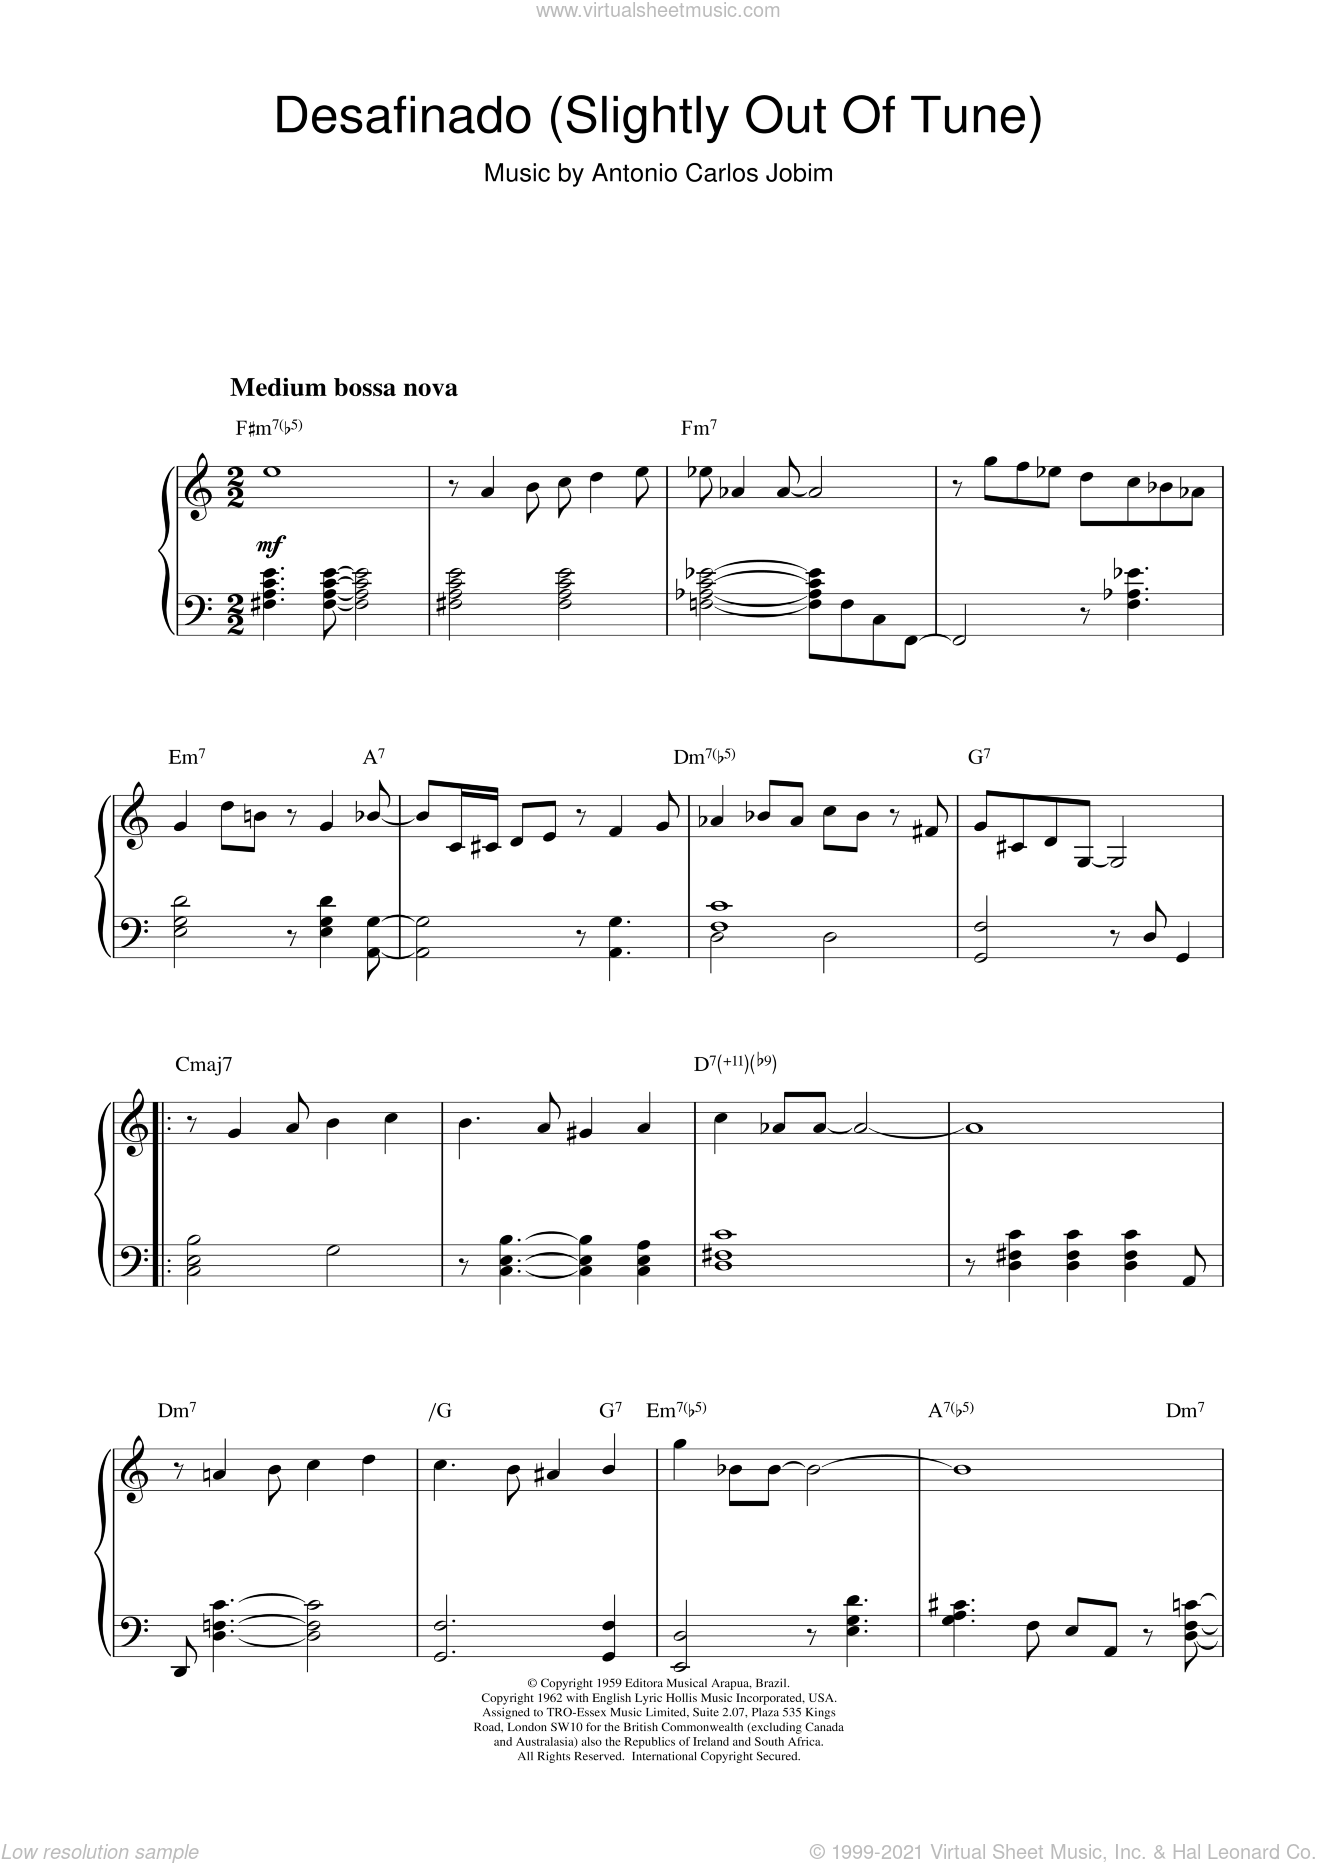 Desafinado (Slightly Out Of Tune) sheet music for piano solo by Antonio Carlos Jobim, George Gershwin, Jessie Cavanaugh and Jon Hendricks, intermediate skill level